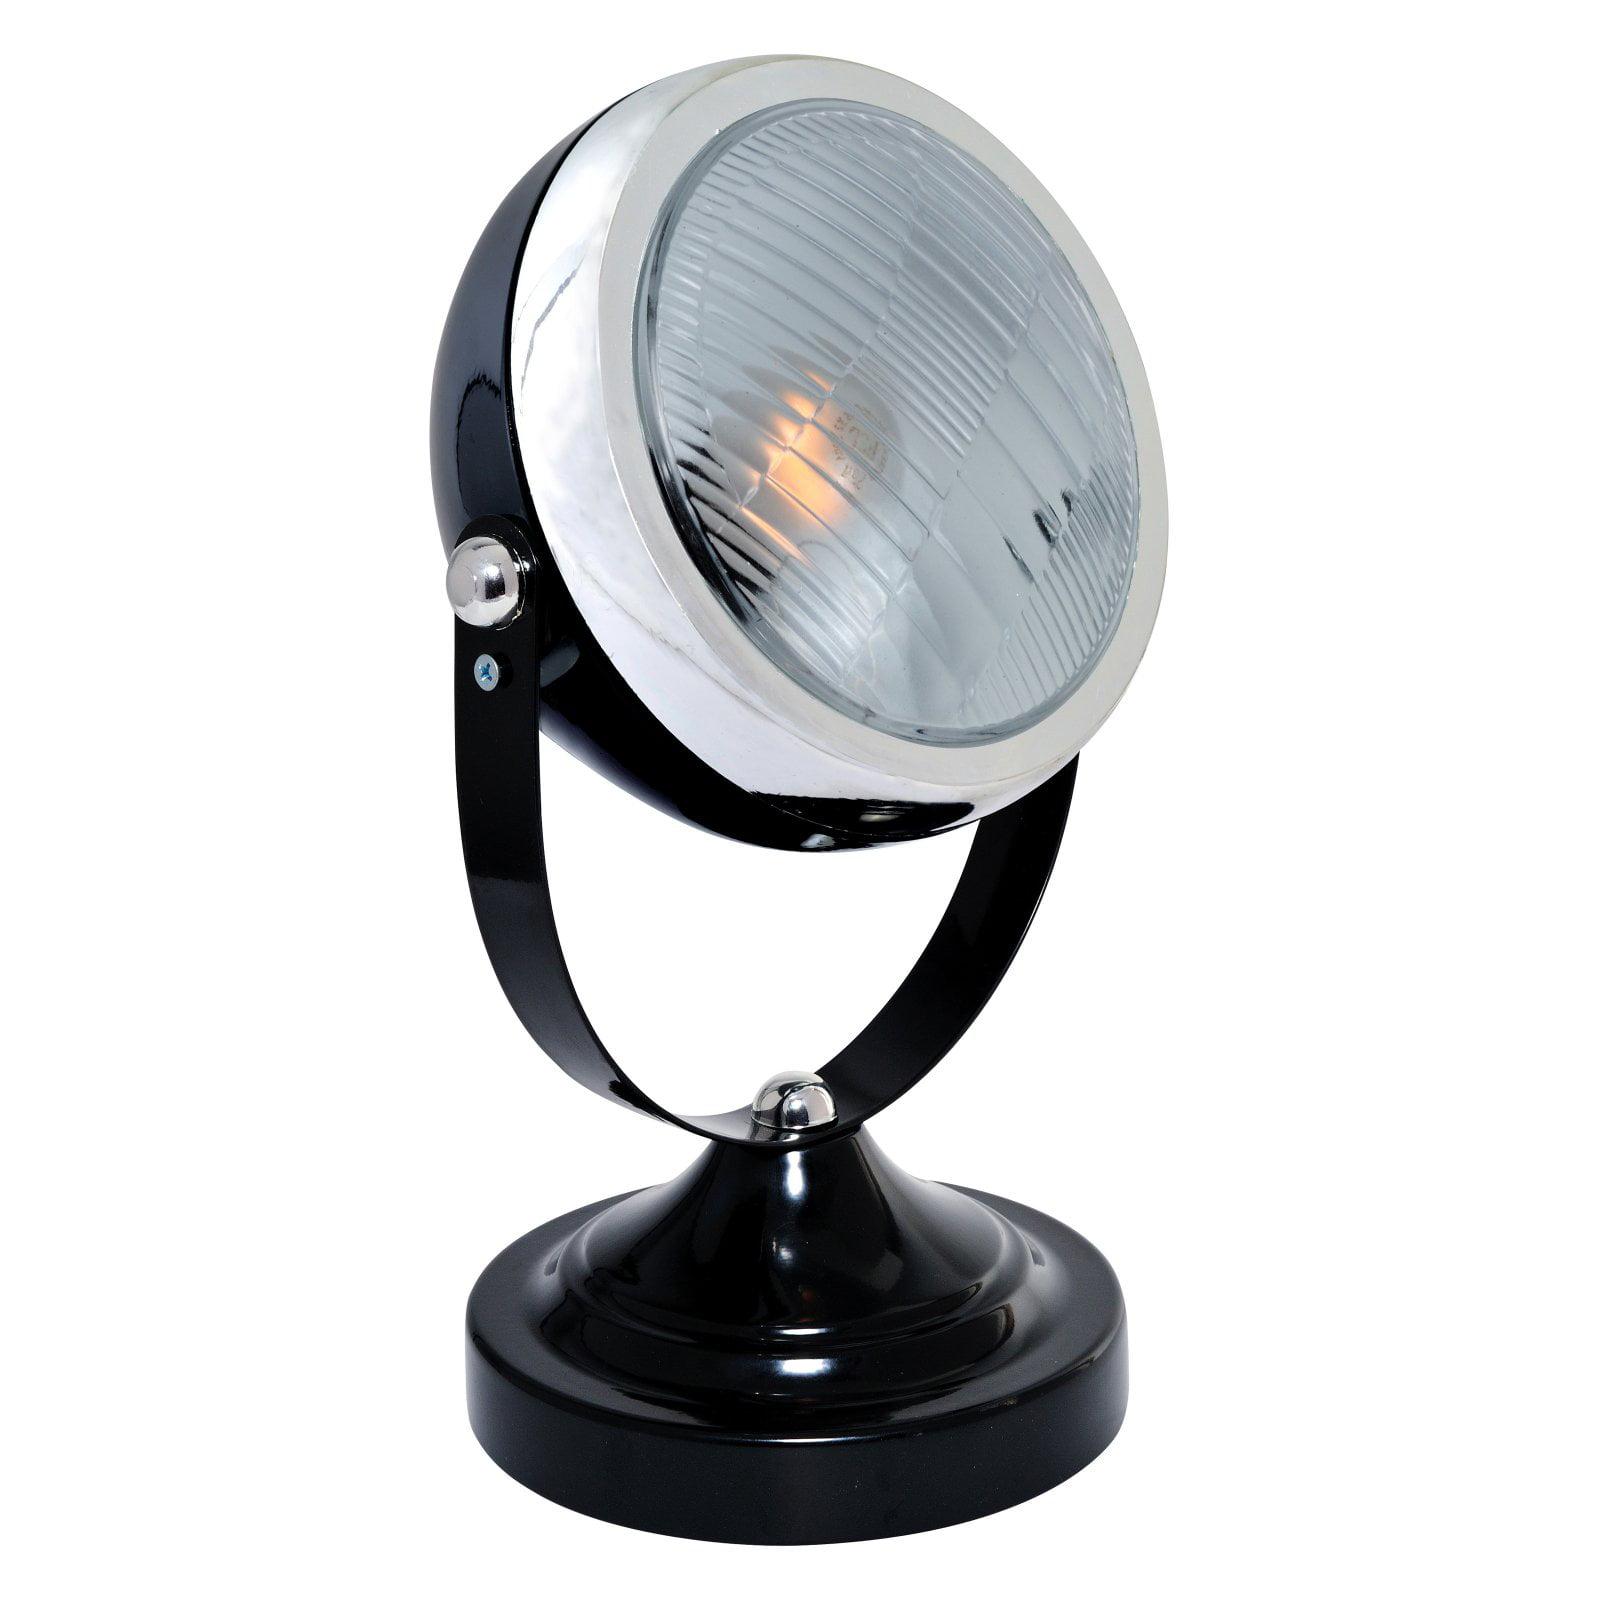 Headlite Table Lamp Black (Includes CFL Light Bulb) - Lite Source